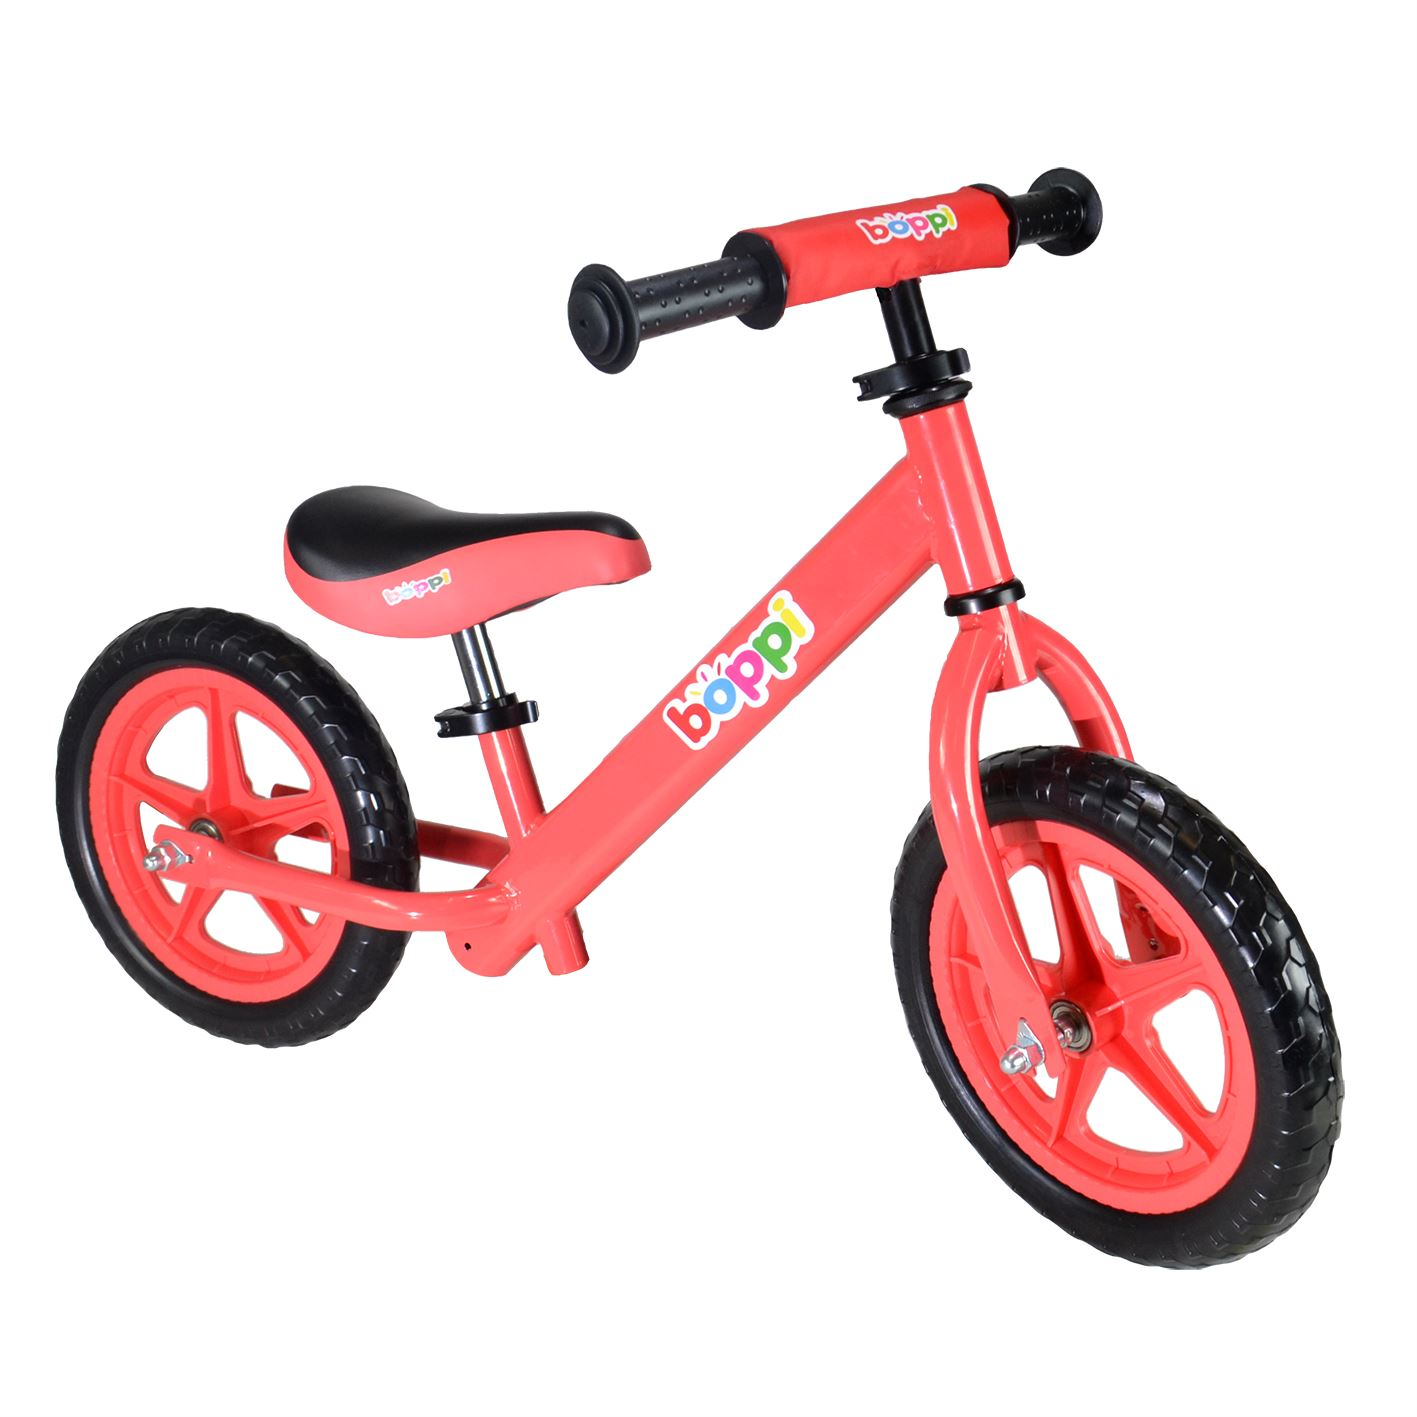 Boppi Childrens Kids Balance Bike Metal Boys Girls Kids